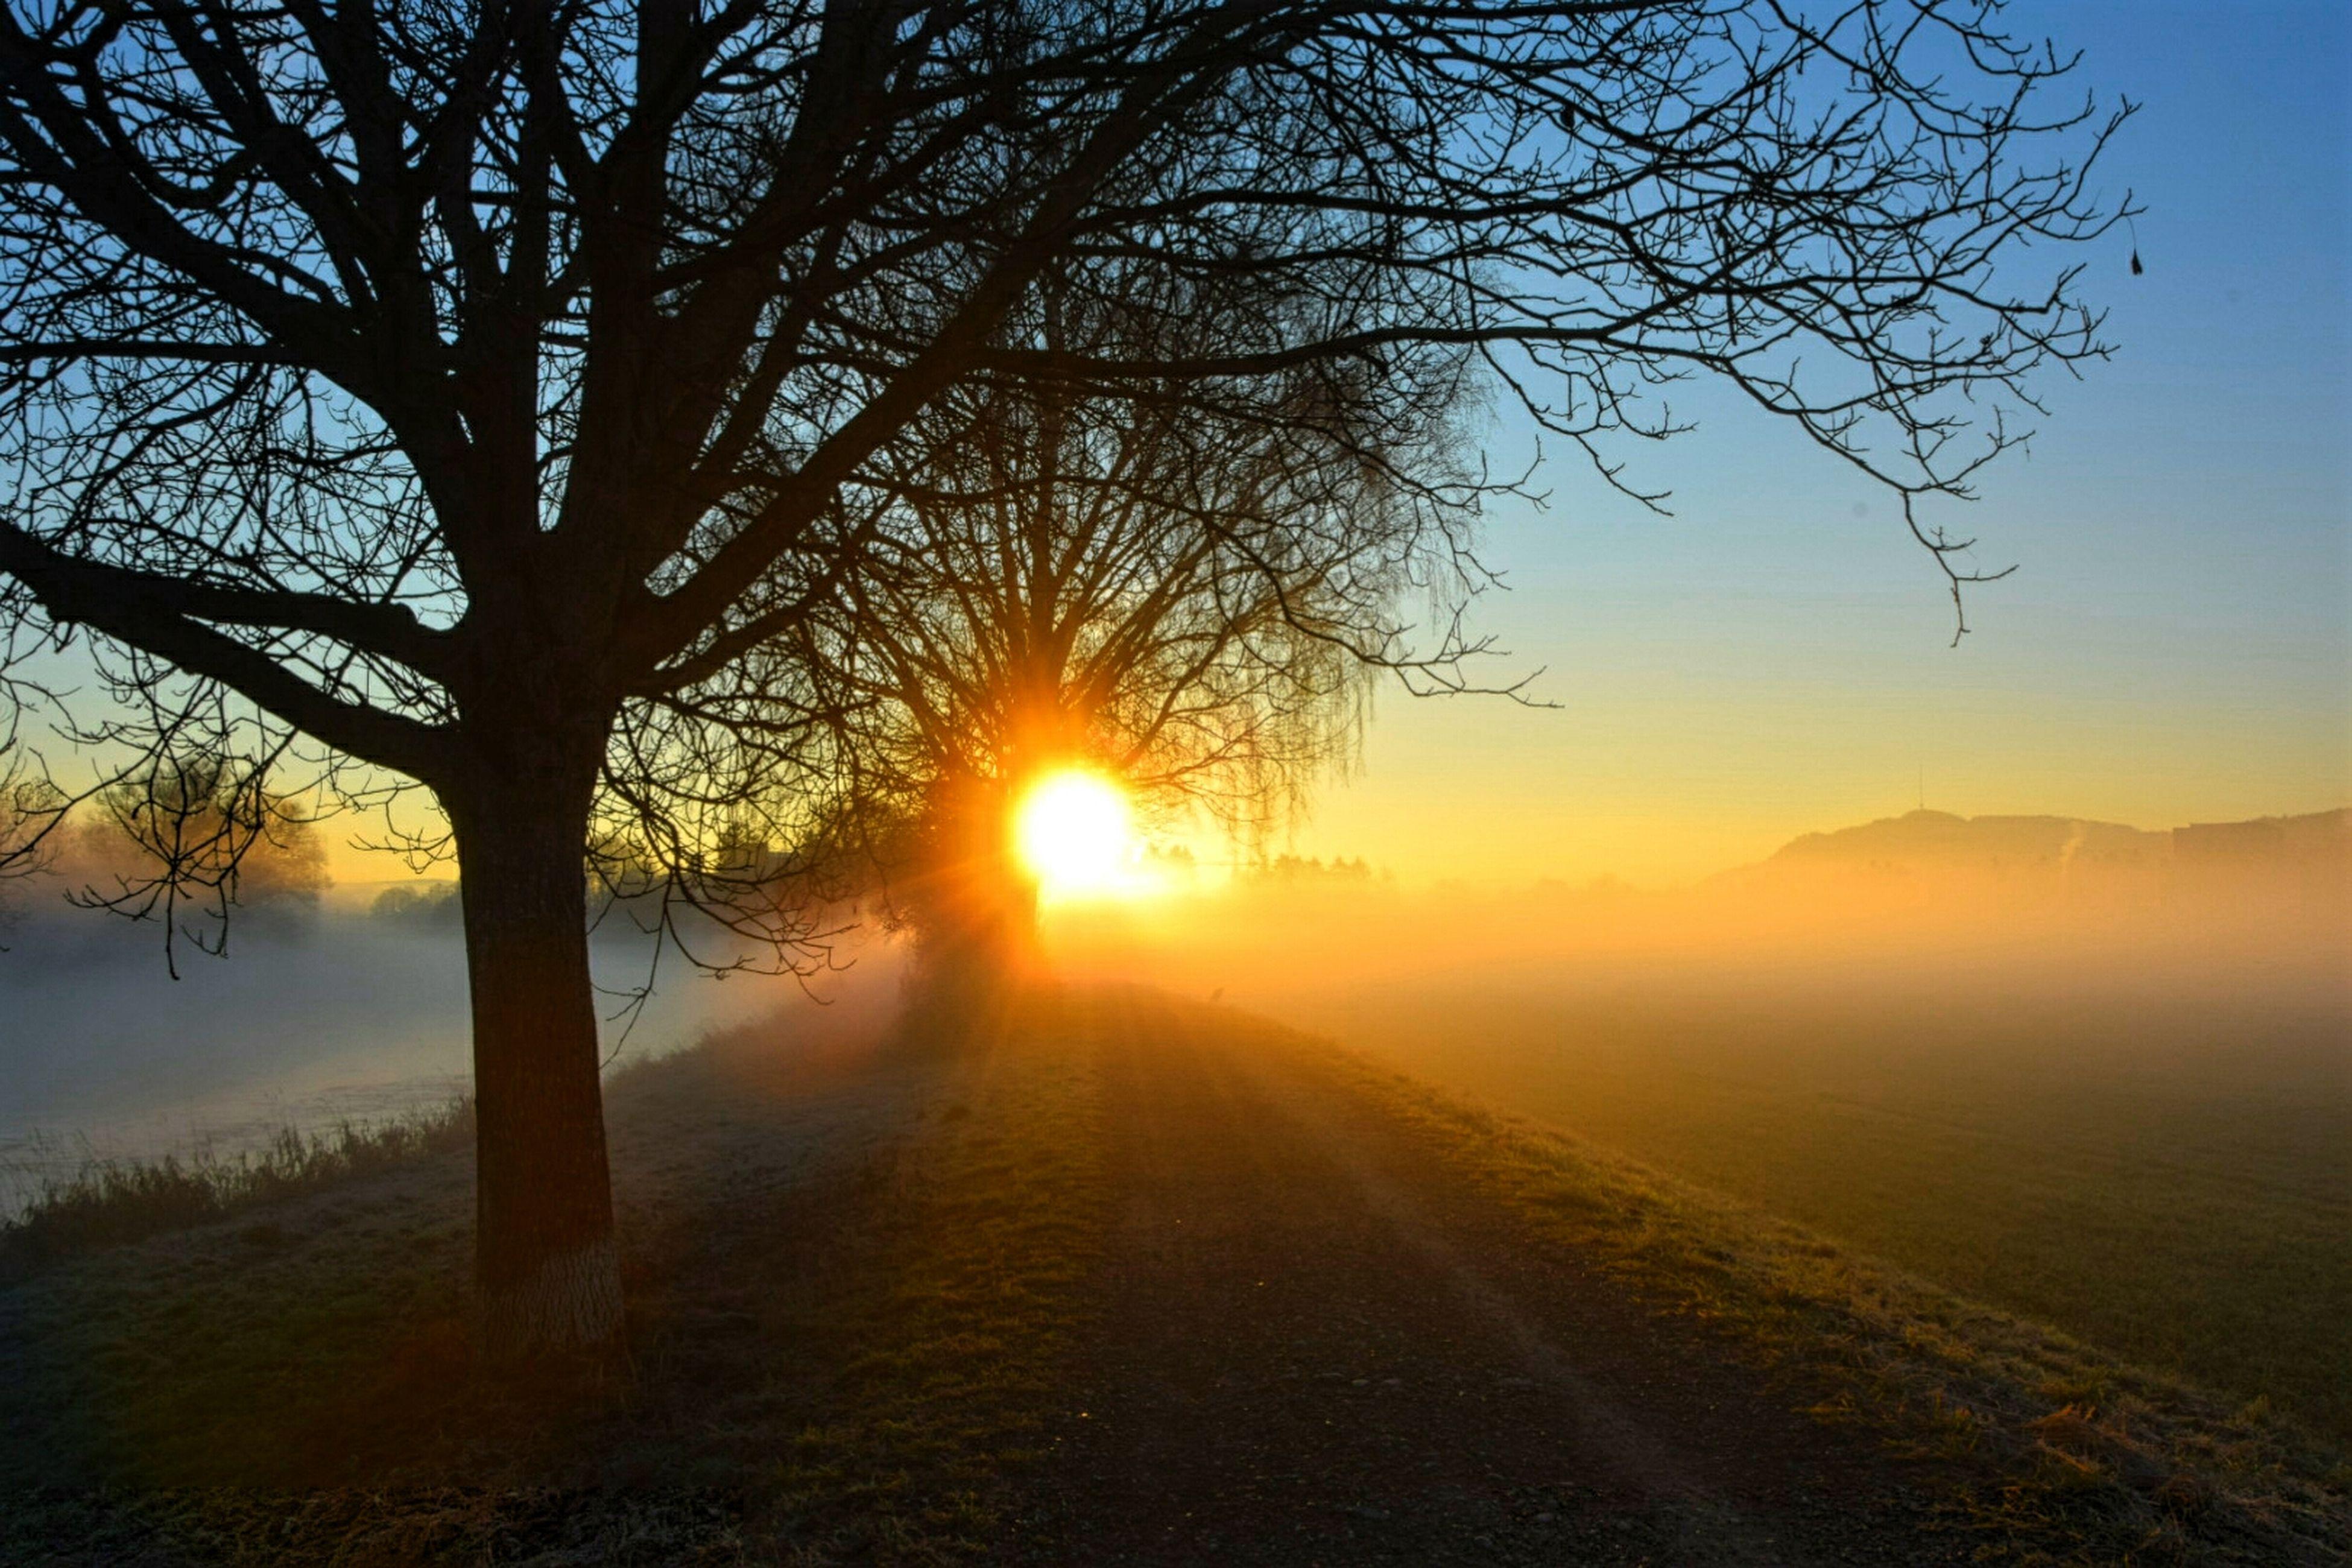 sunset, sun, tranquility, bare tree, tranquil scene, scenics, tree, beauty in nature, landscape, nature, silhouette, sunlight, sky, idyllic, sunbeam, the way forward, orange color, non-urban scene, branch, lens flare